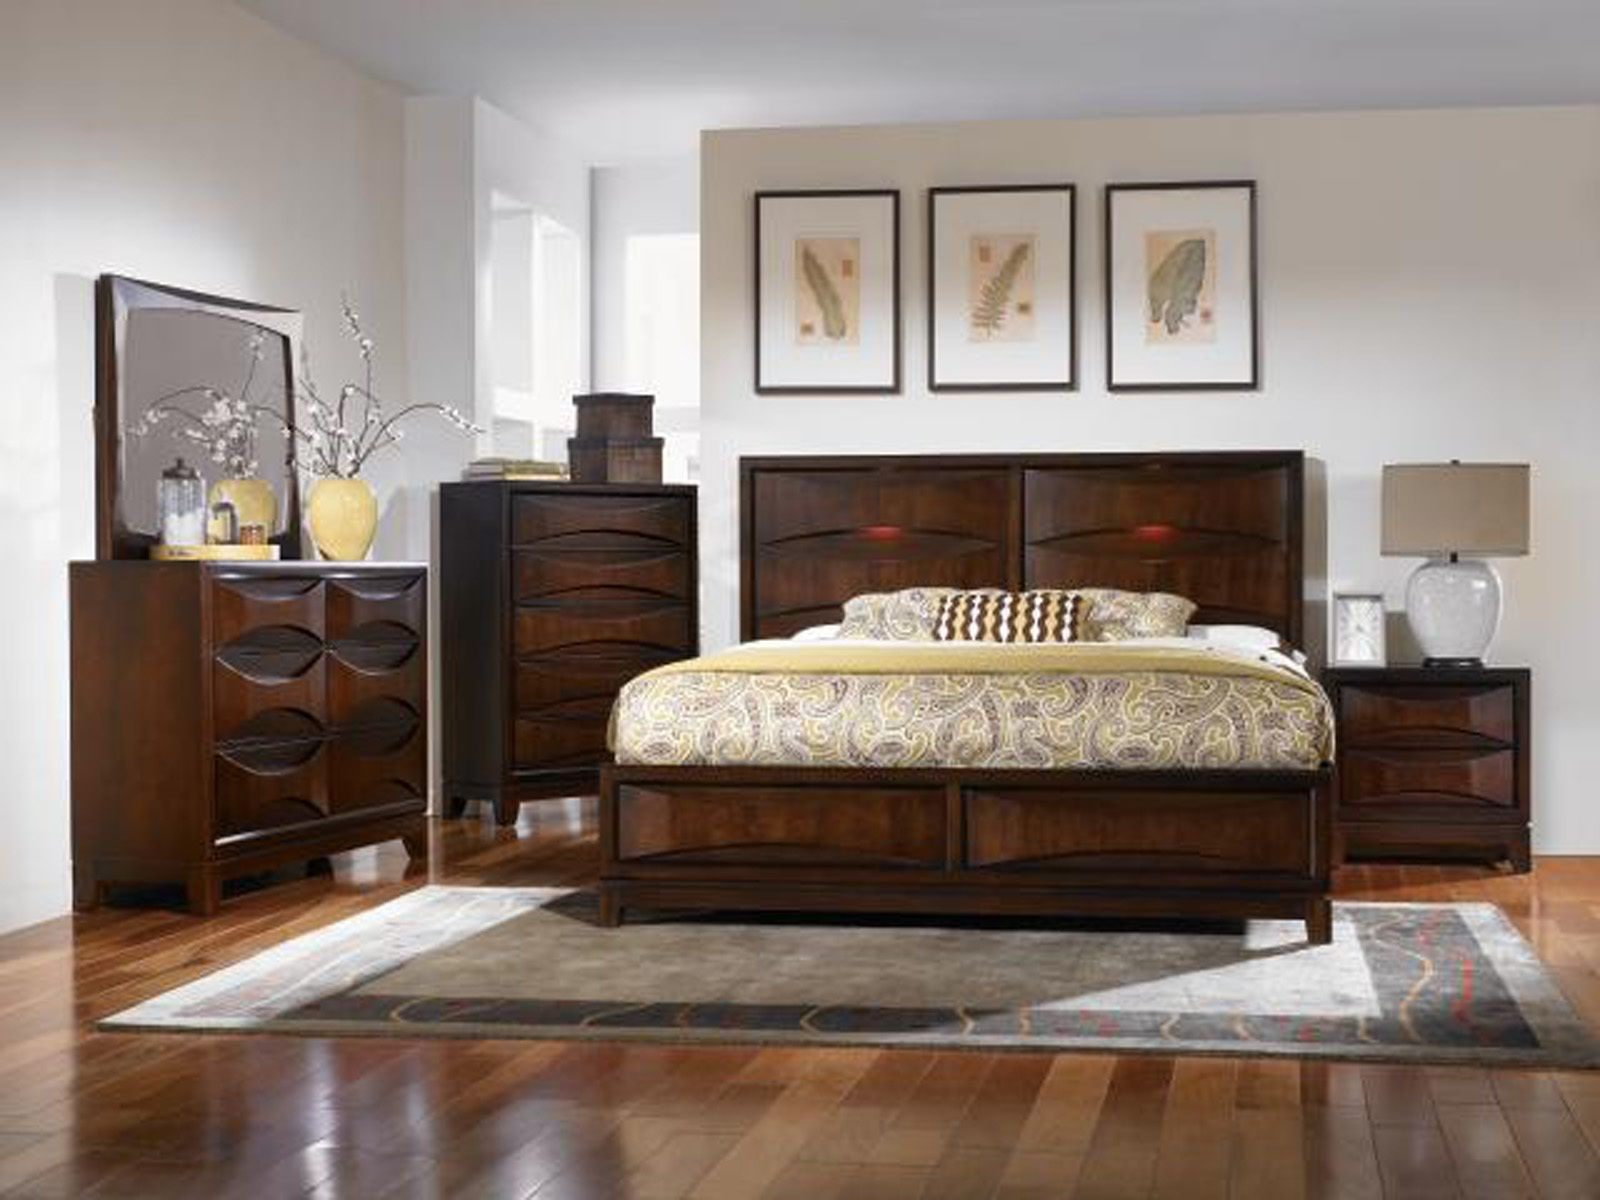 Inspiring Thomasville Bedroom Sets Bedroom Furniture Sets Thomasville Furniture Thomasville Furniture Bedroom